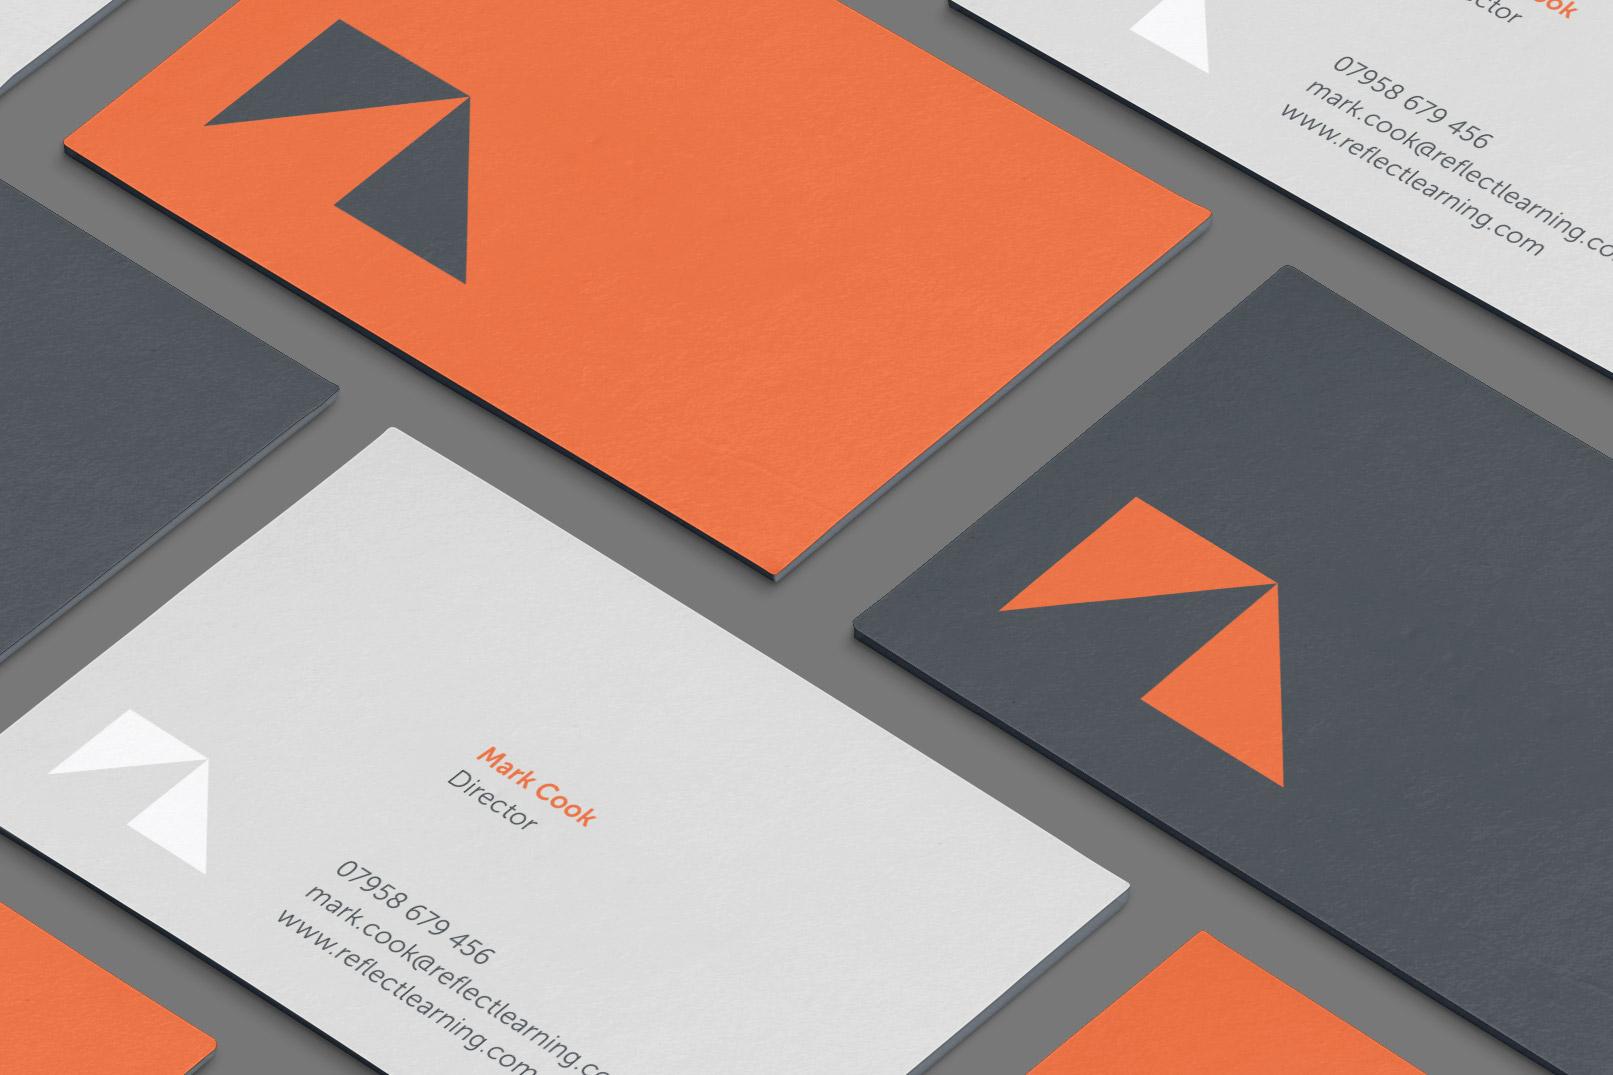 Business card branding design for Reflect Learning